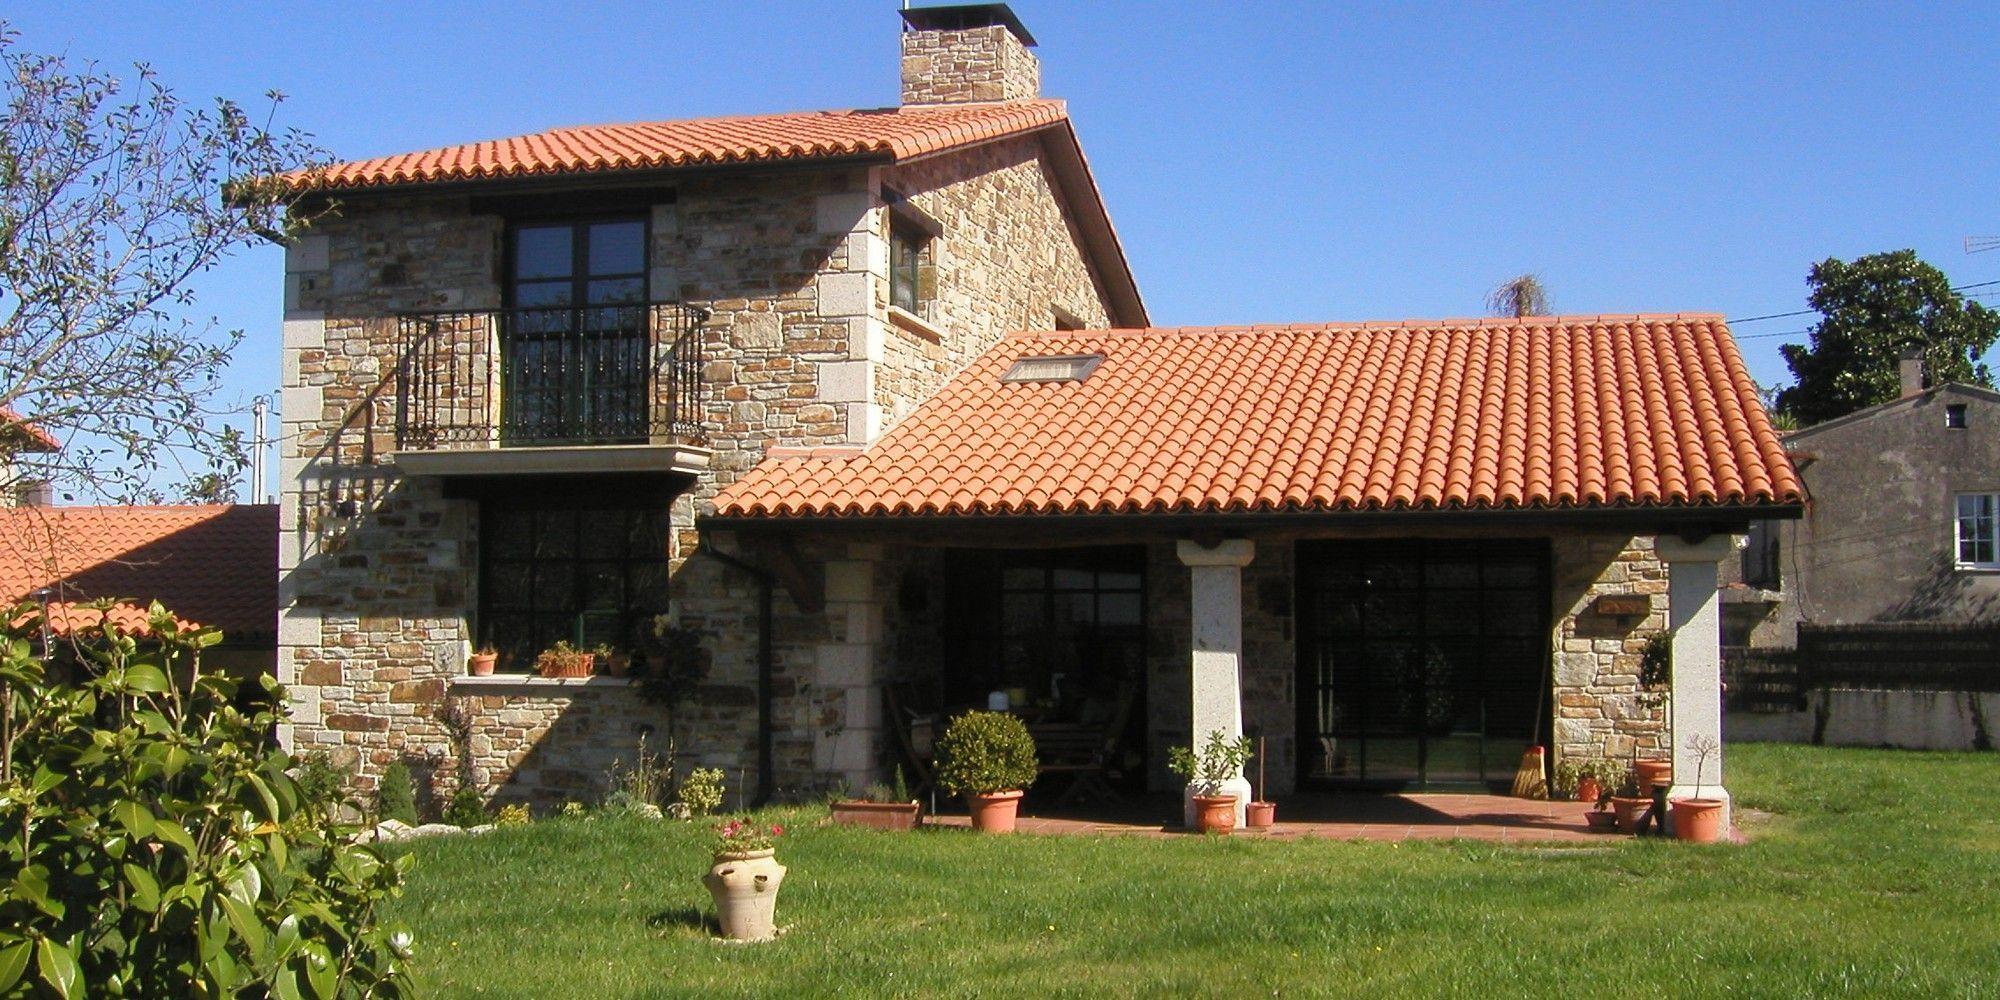 Casas Rusticas Modernas 1 Casasrusticasmodernas Stone House House Exterior Stone Houses